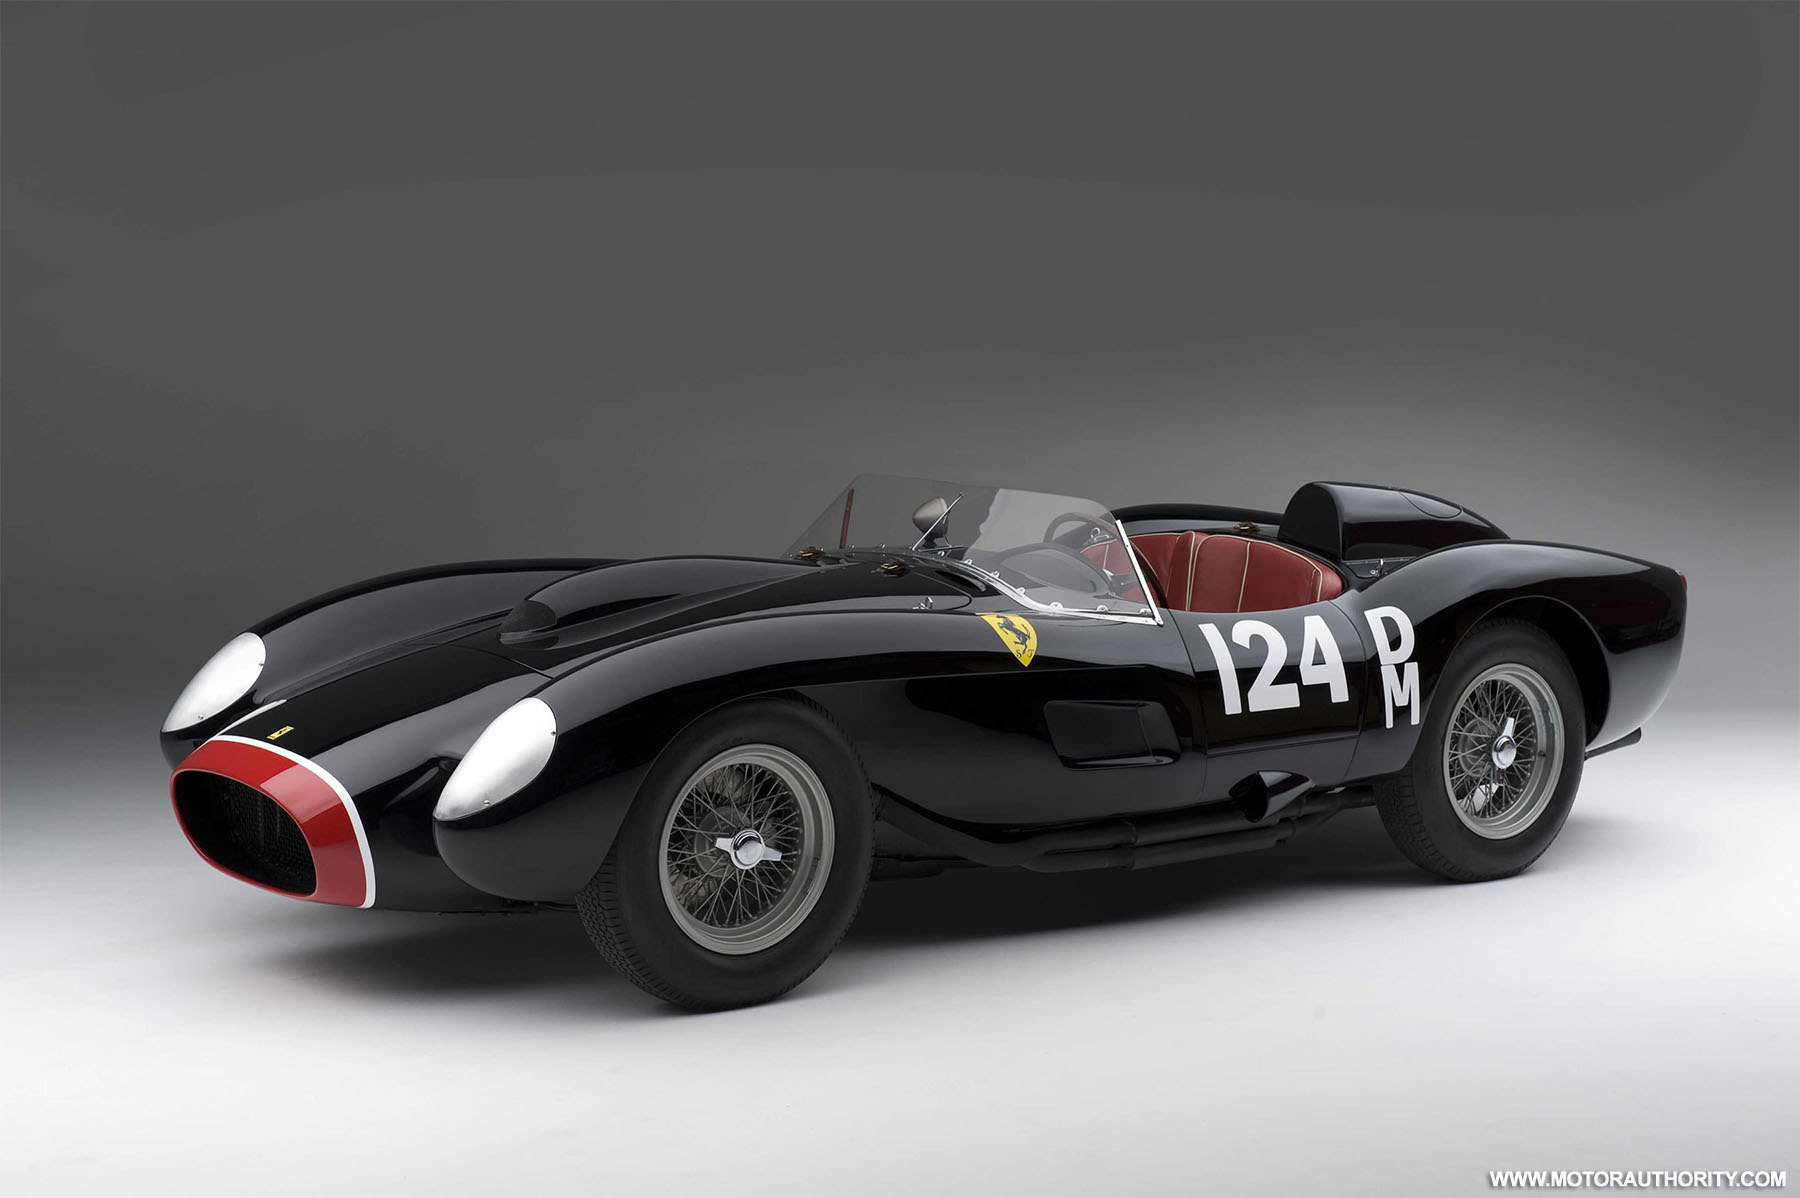 Ferrari 250 testarossa sets new world record for a car sold at auction vanachro Gallery